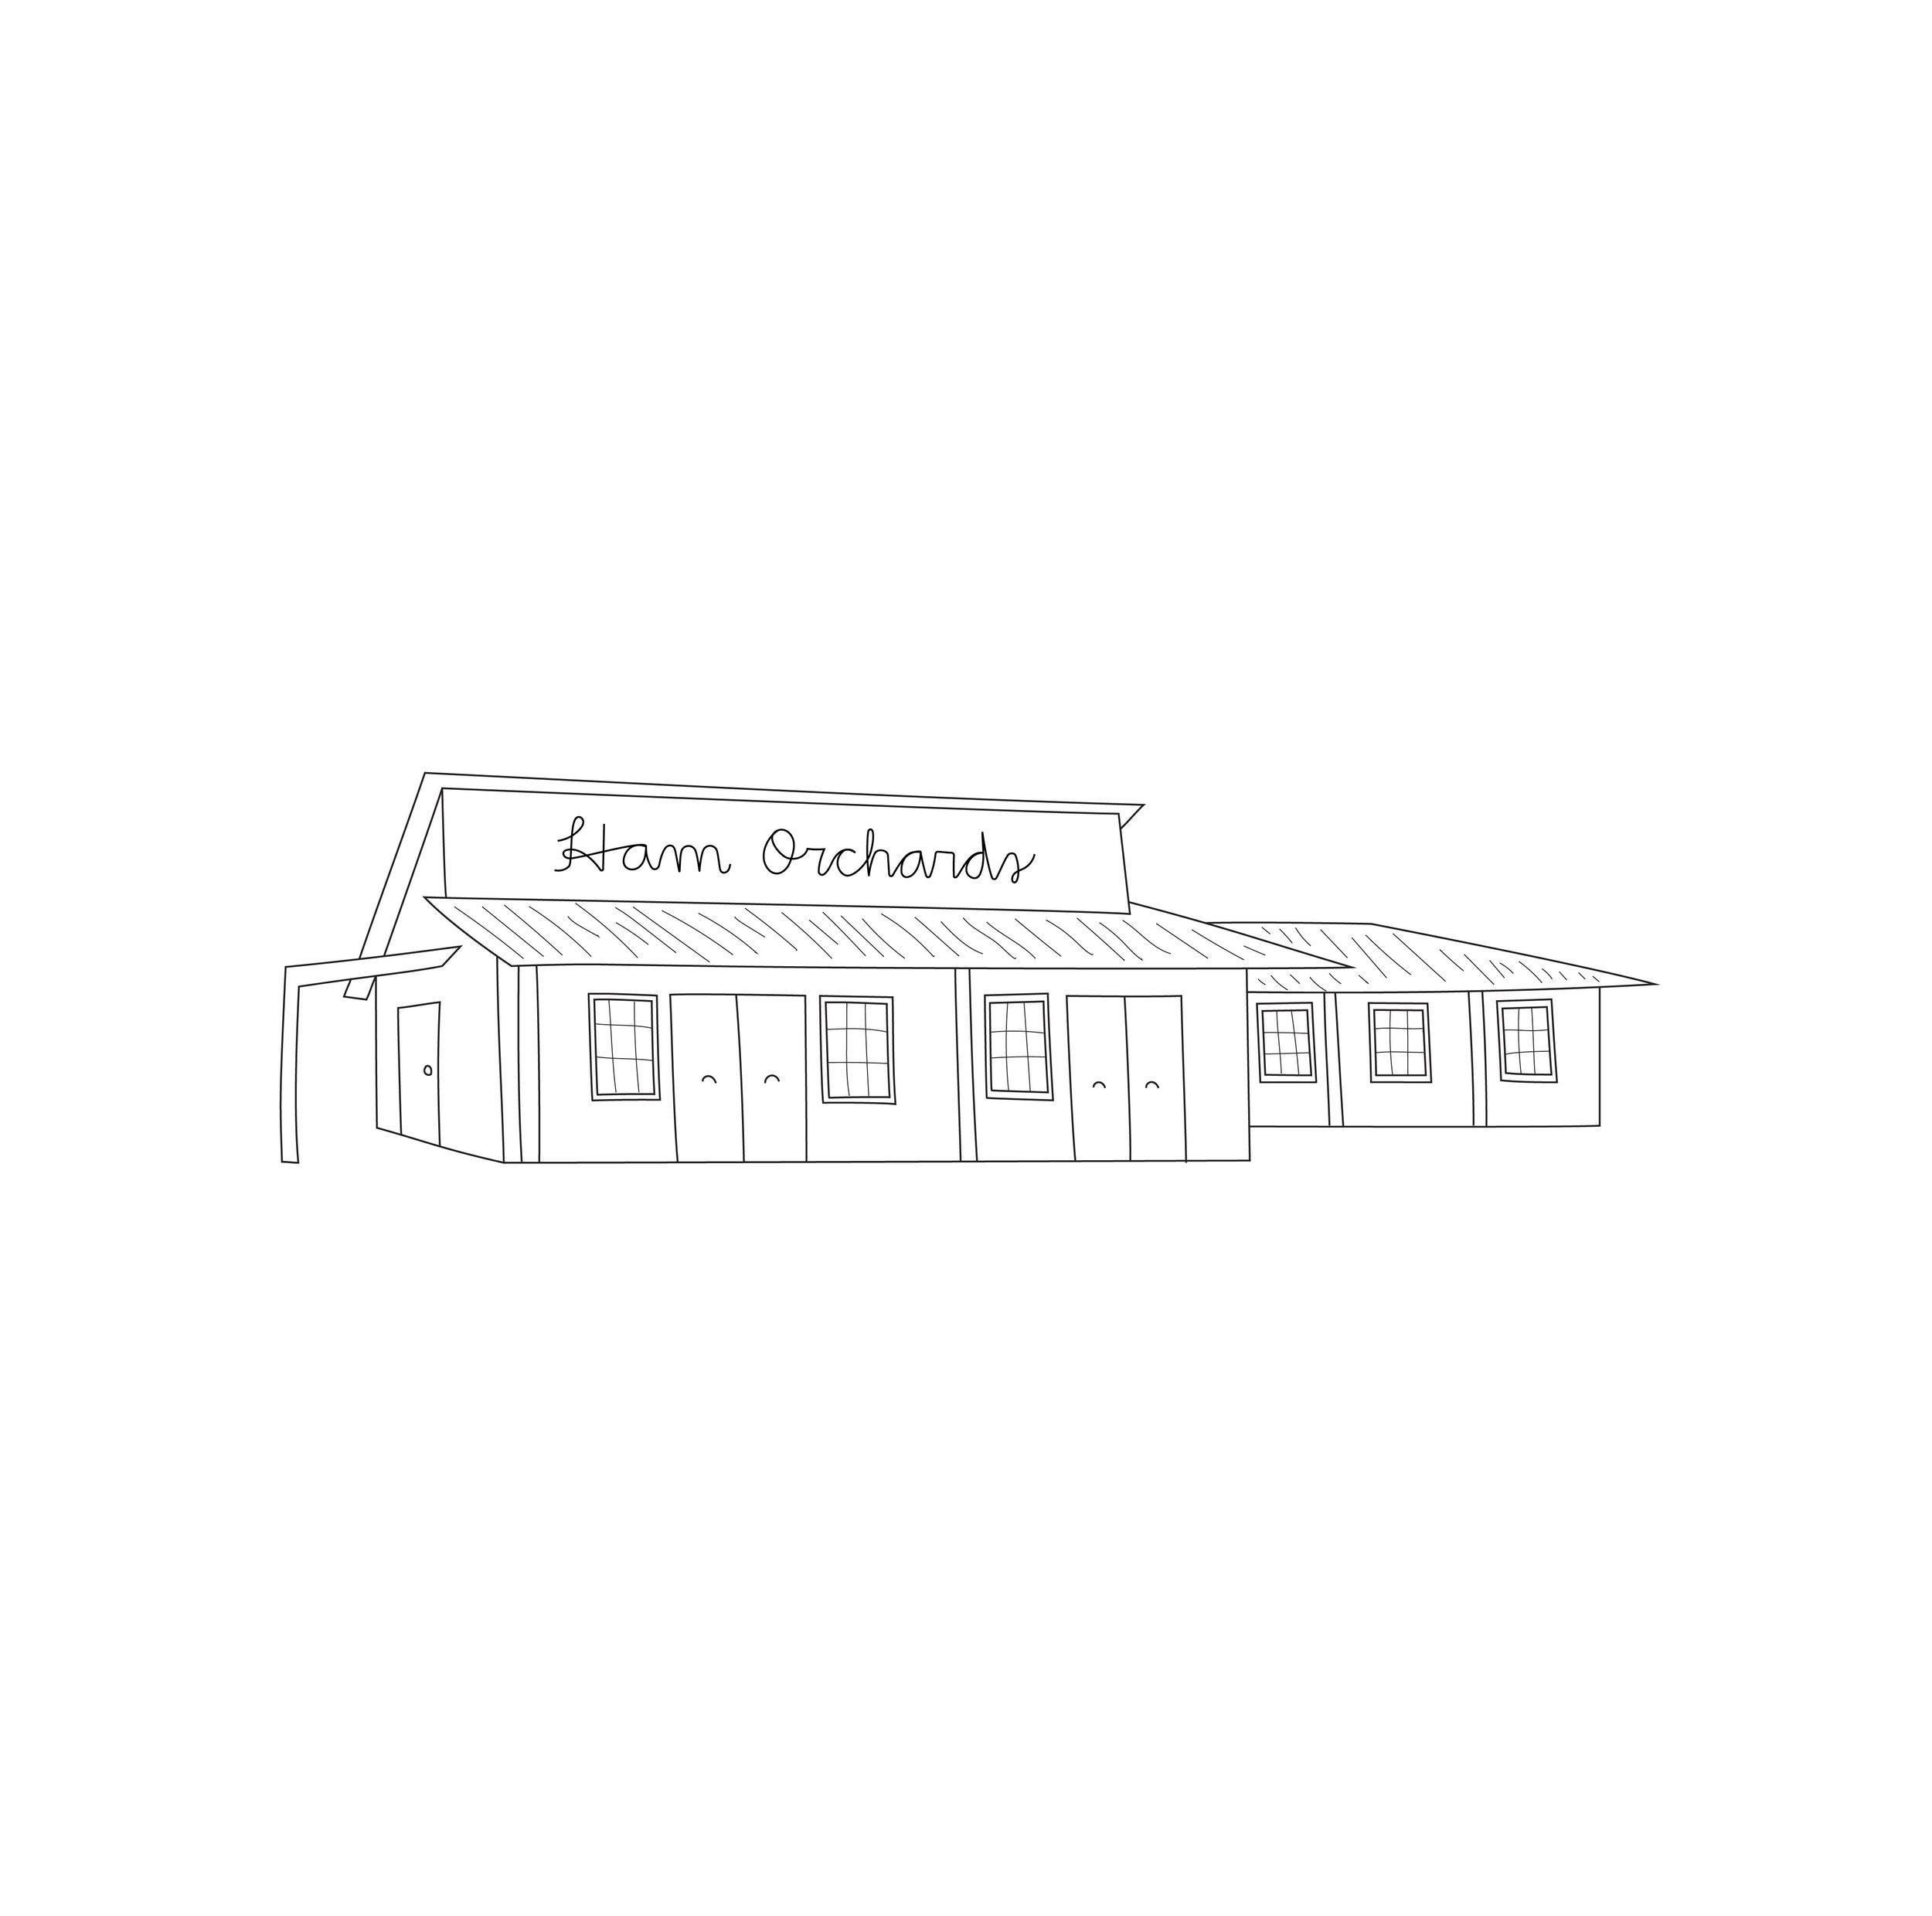 ham orchards_building illustration.jpg